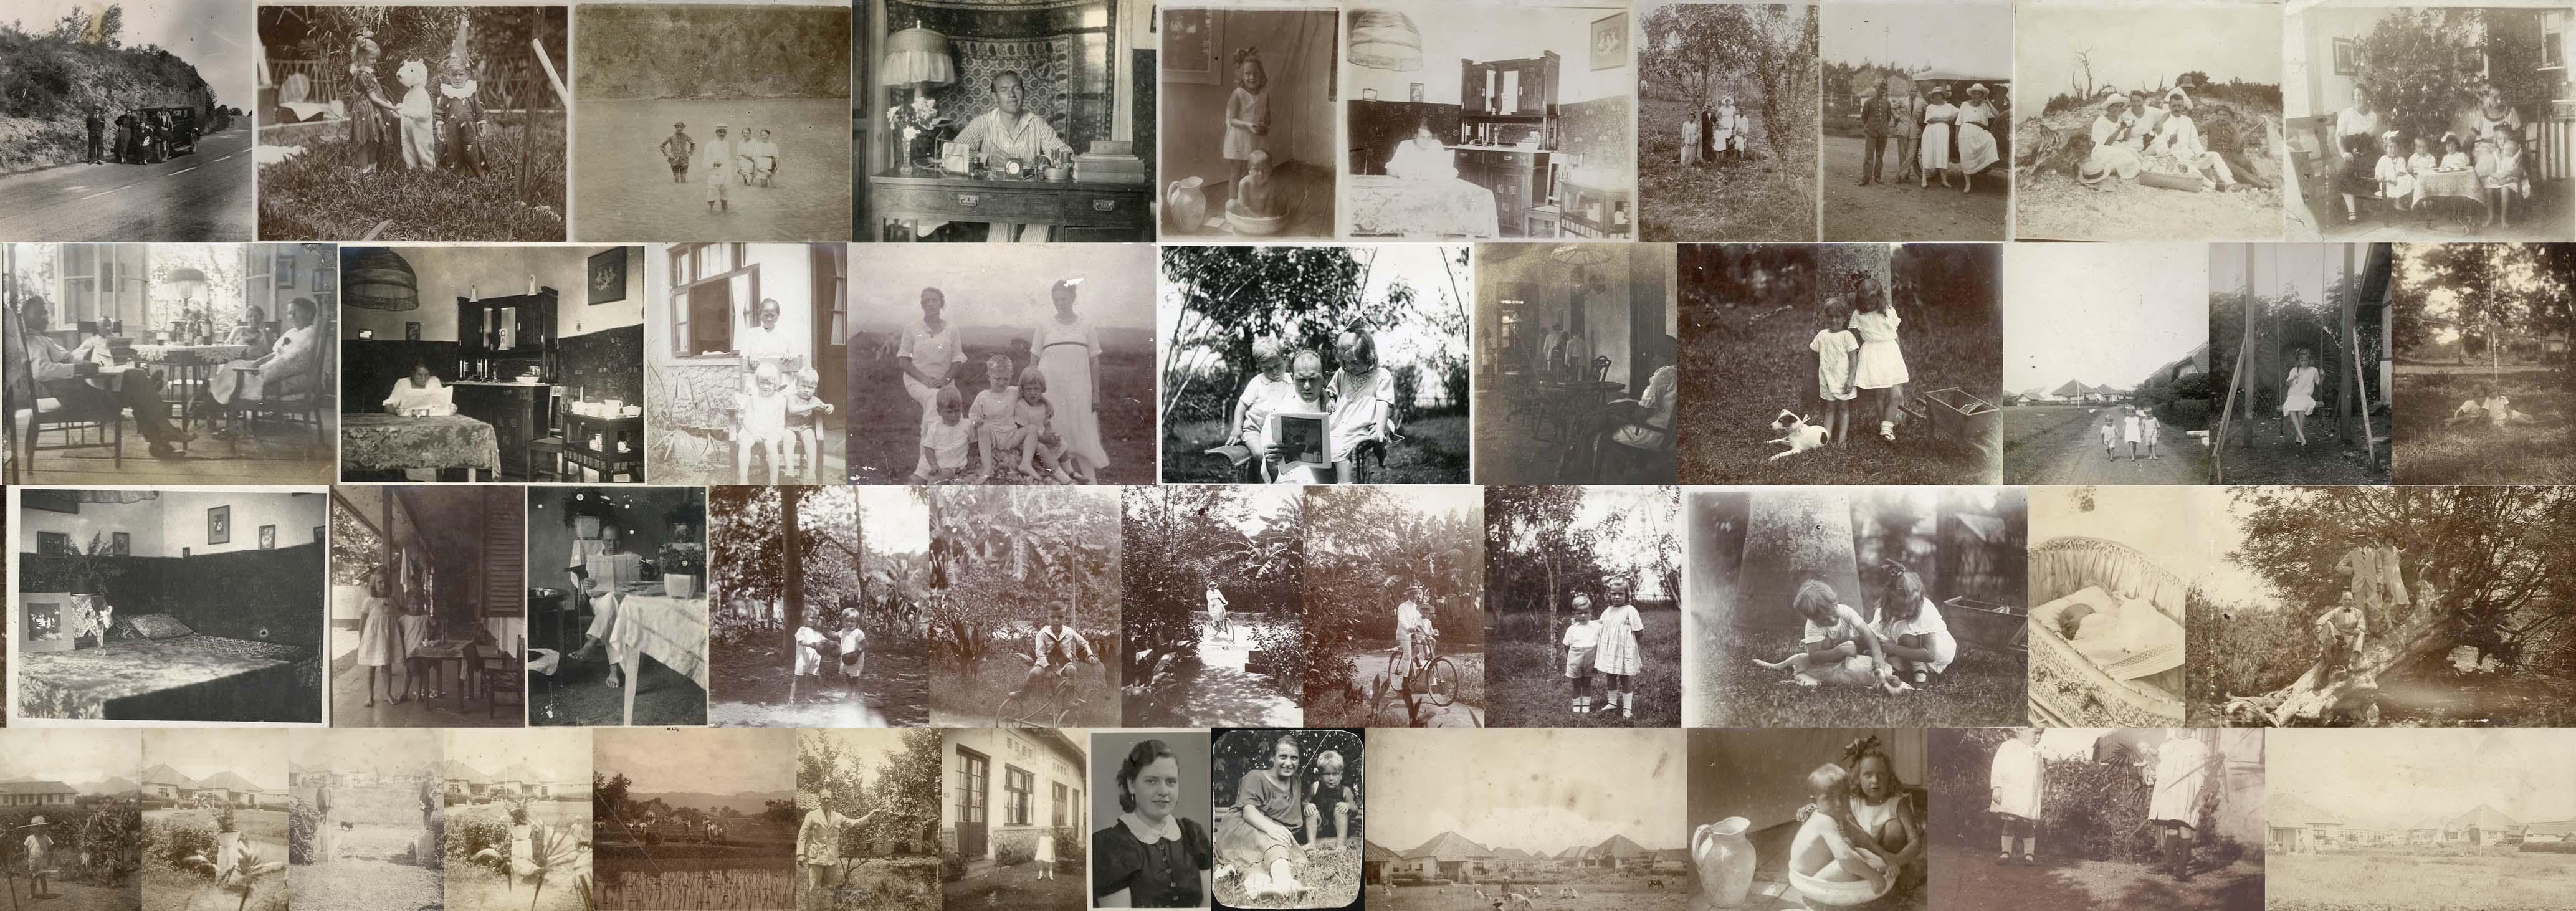 BANDOENG. - Dutch familiy life in Bandoeng, West-Java.  Album with 44 photographs.